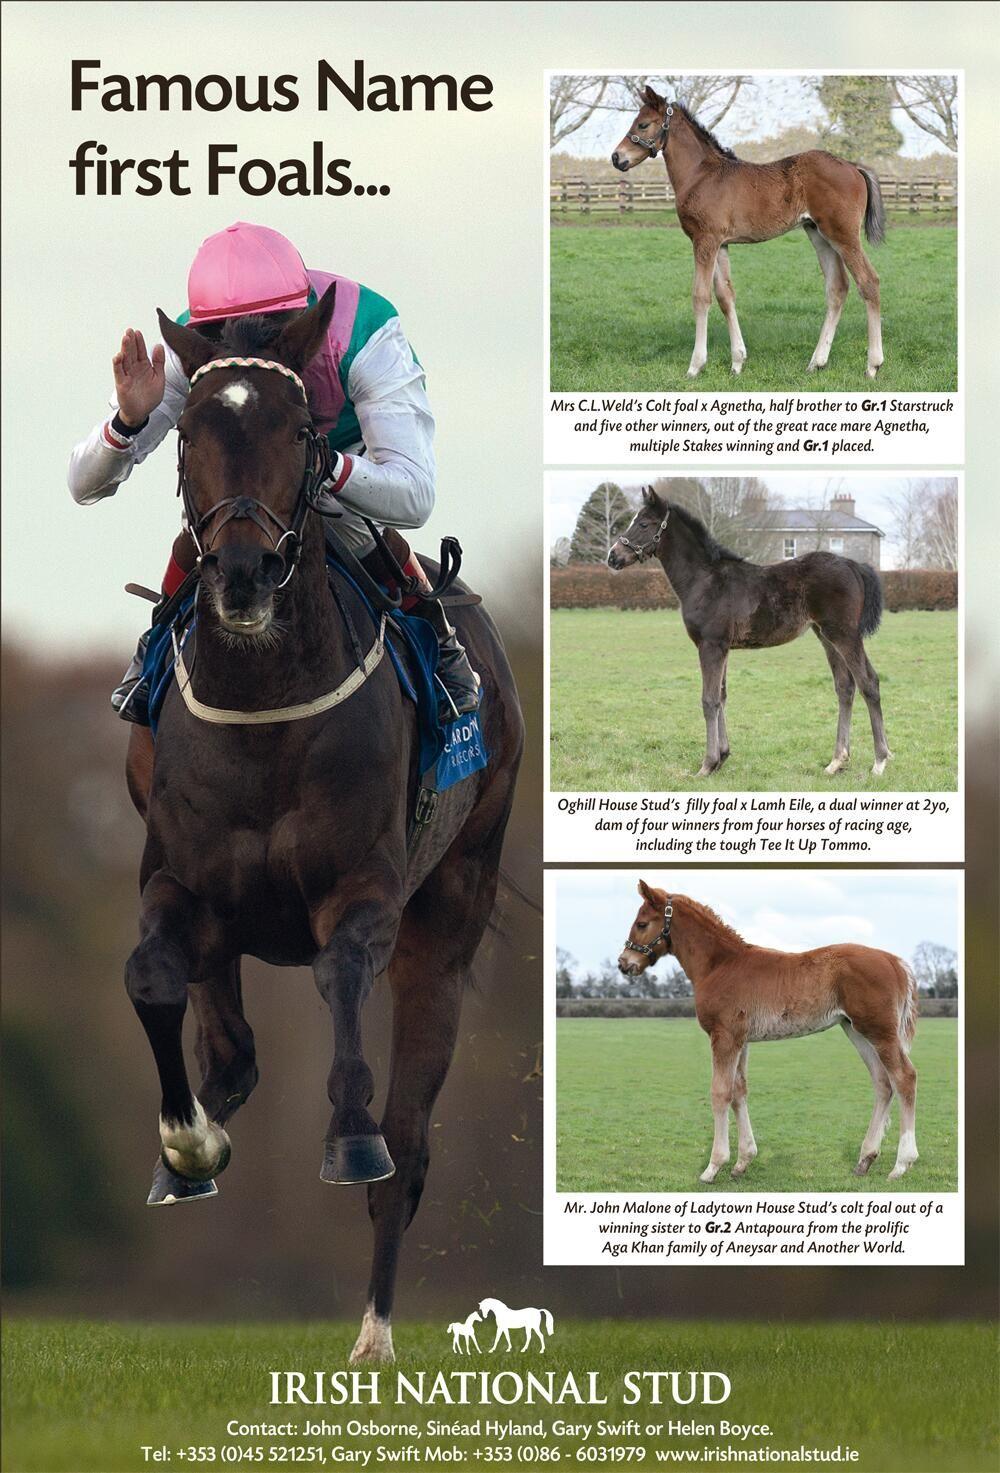 Irish National Stud Irishnatstud On Twitter Horses Foals